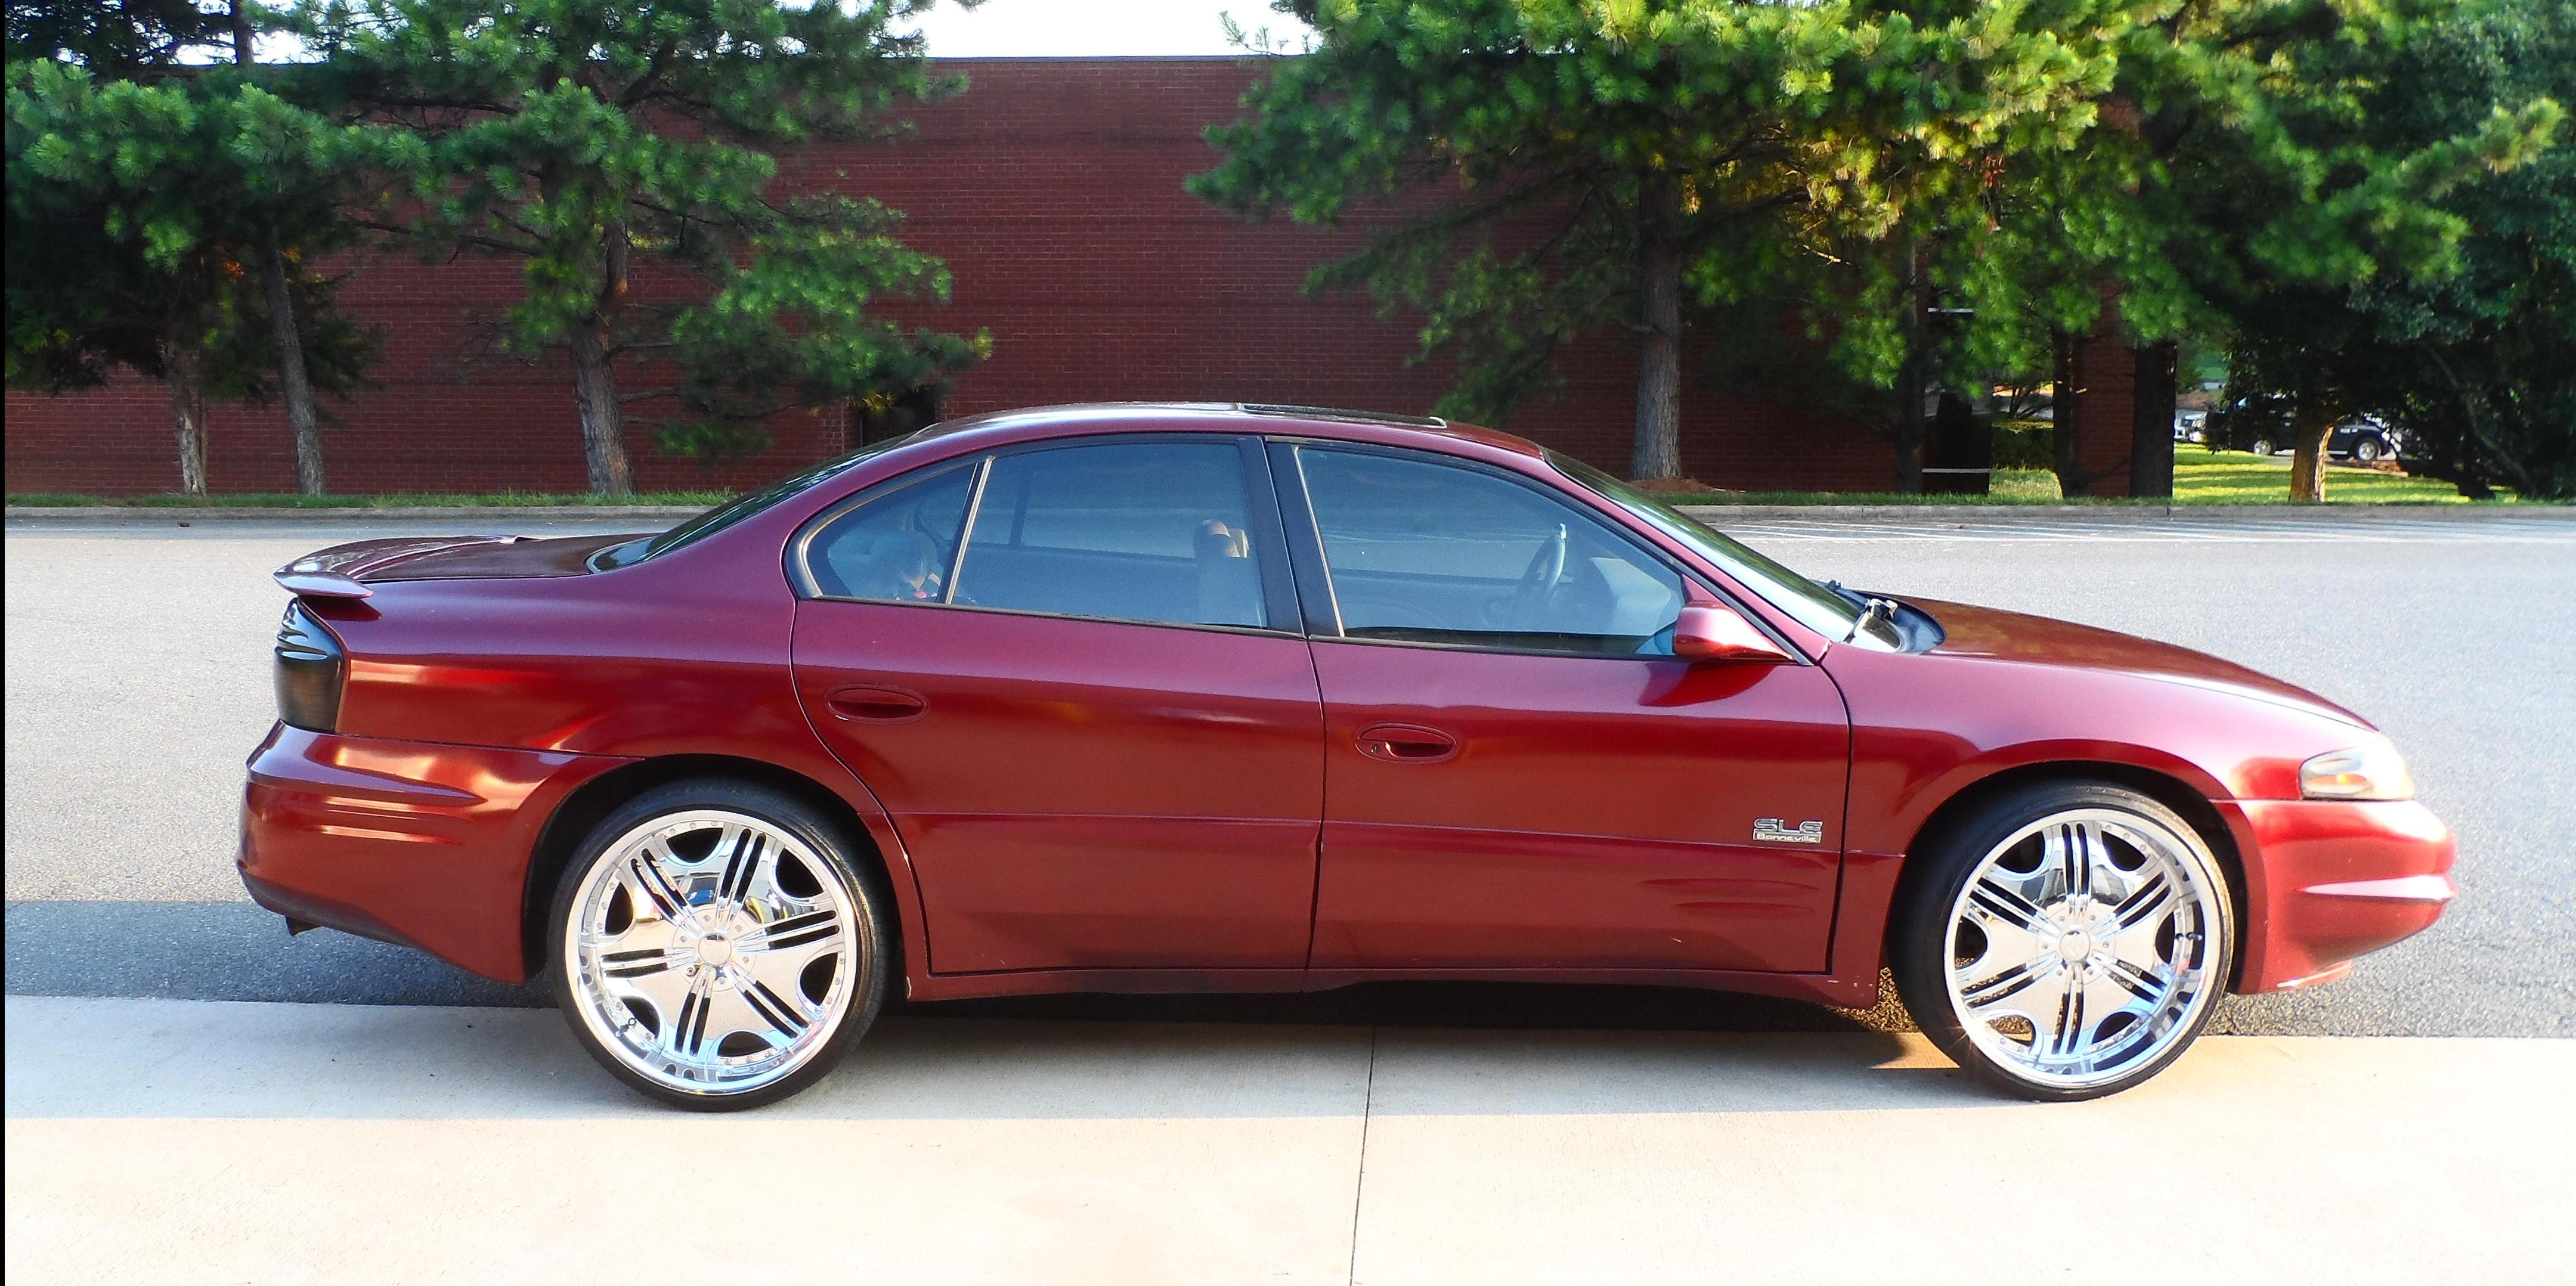 Pontiac Bonneville X 2000 - 2005 Sedan #5